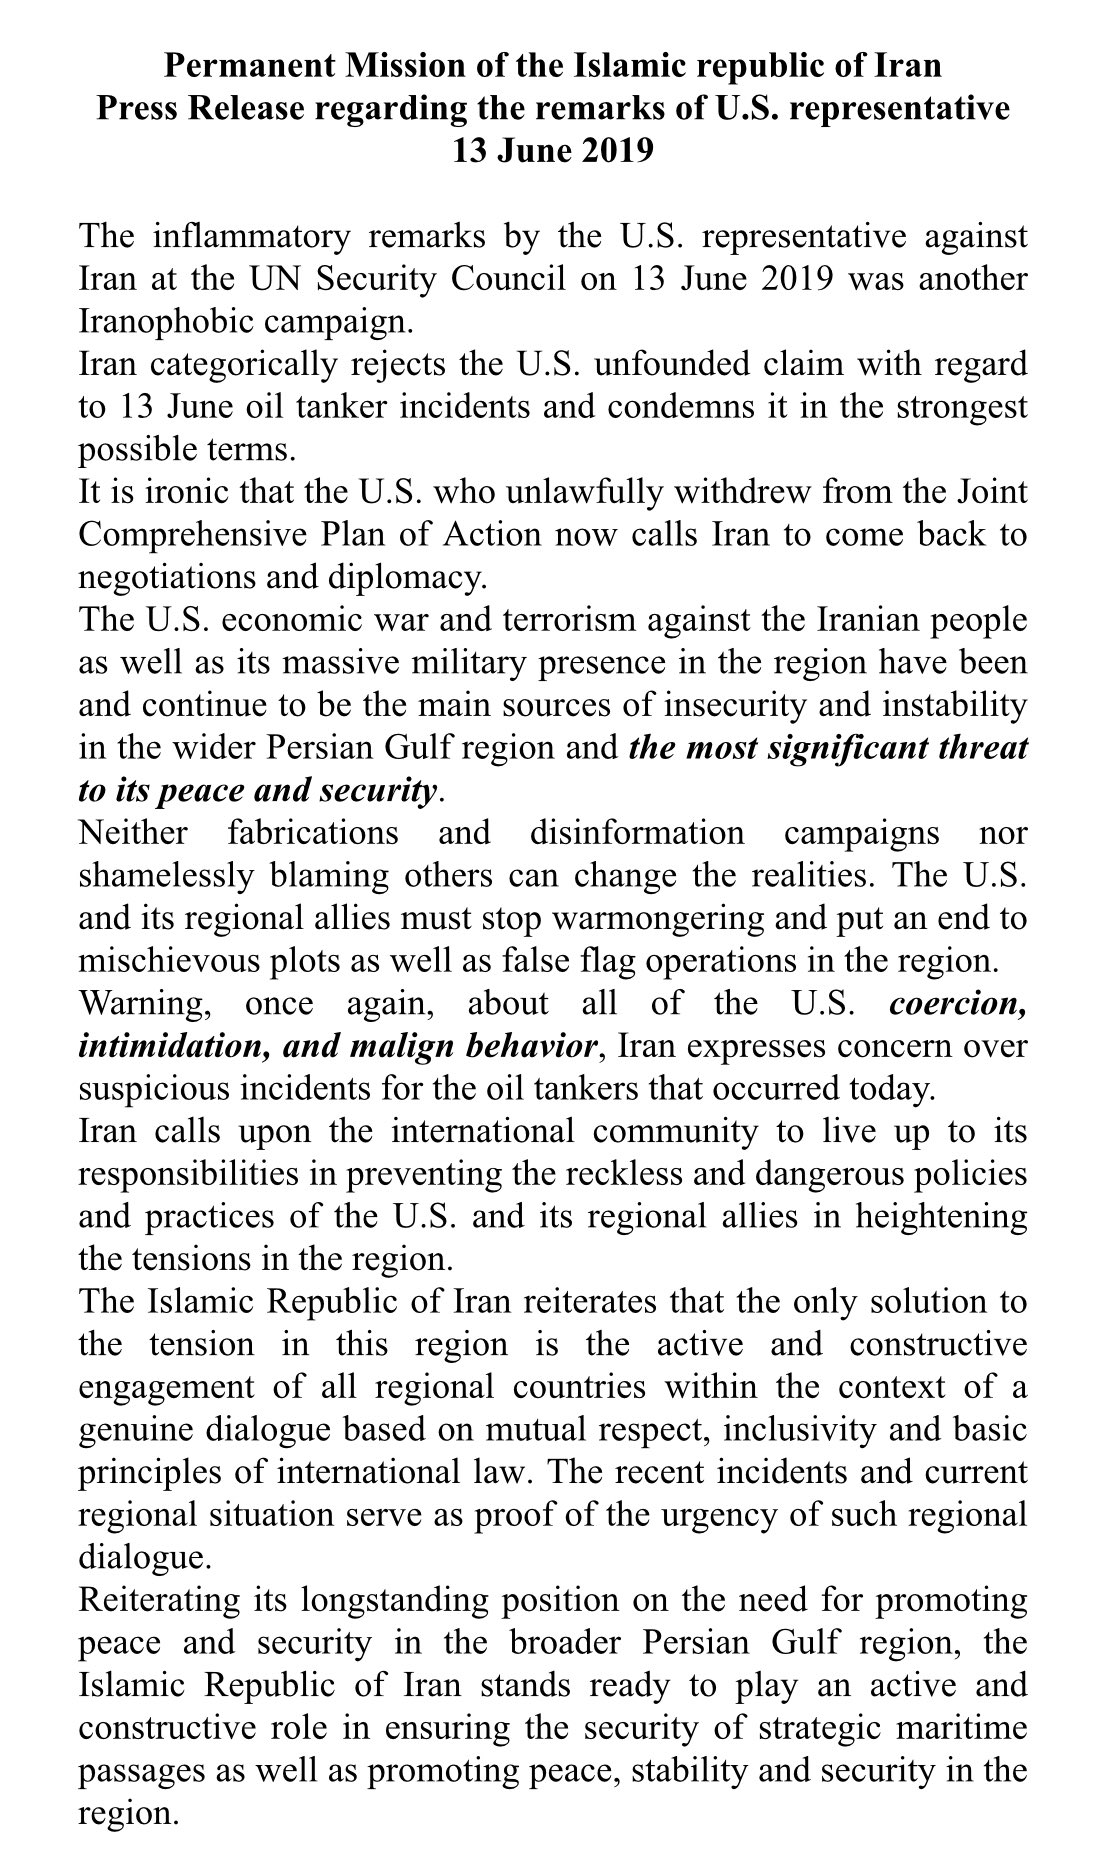 Iran statement